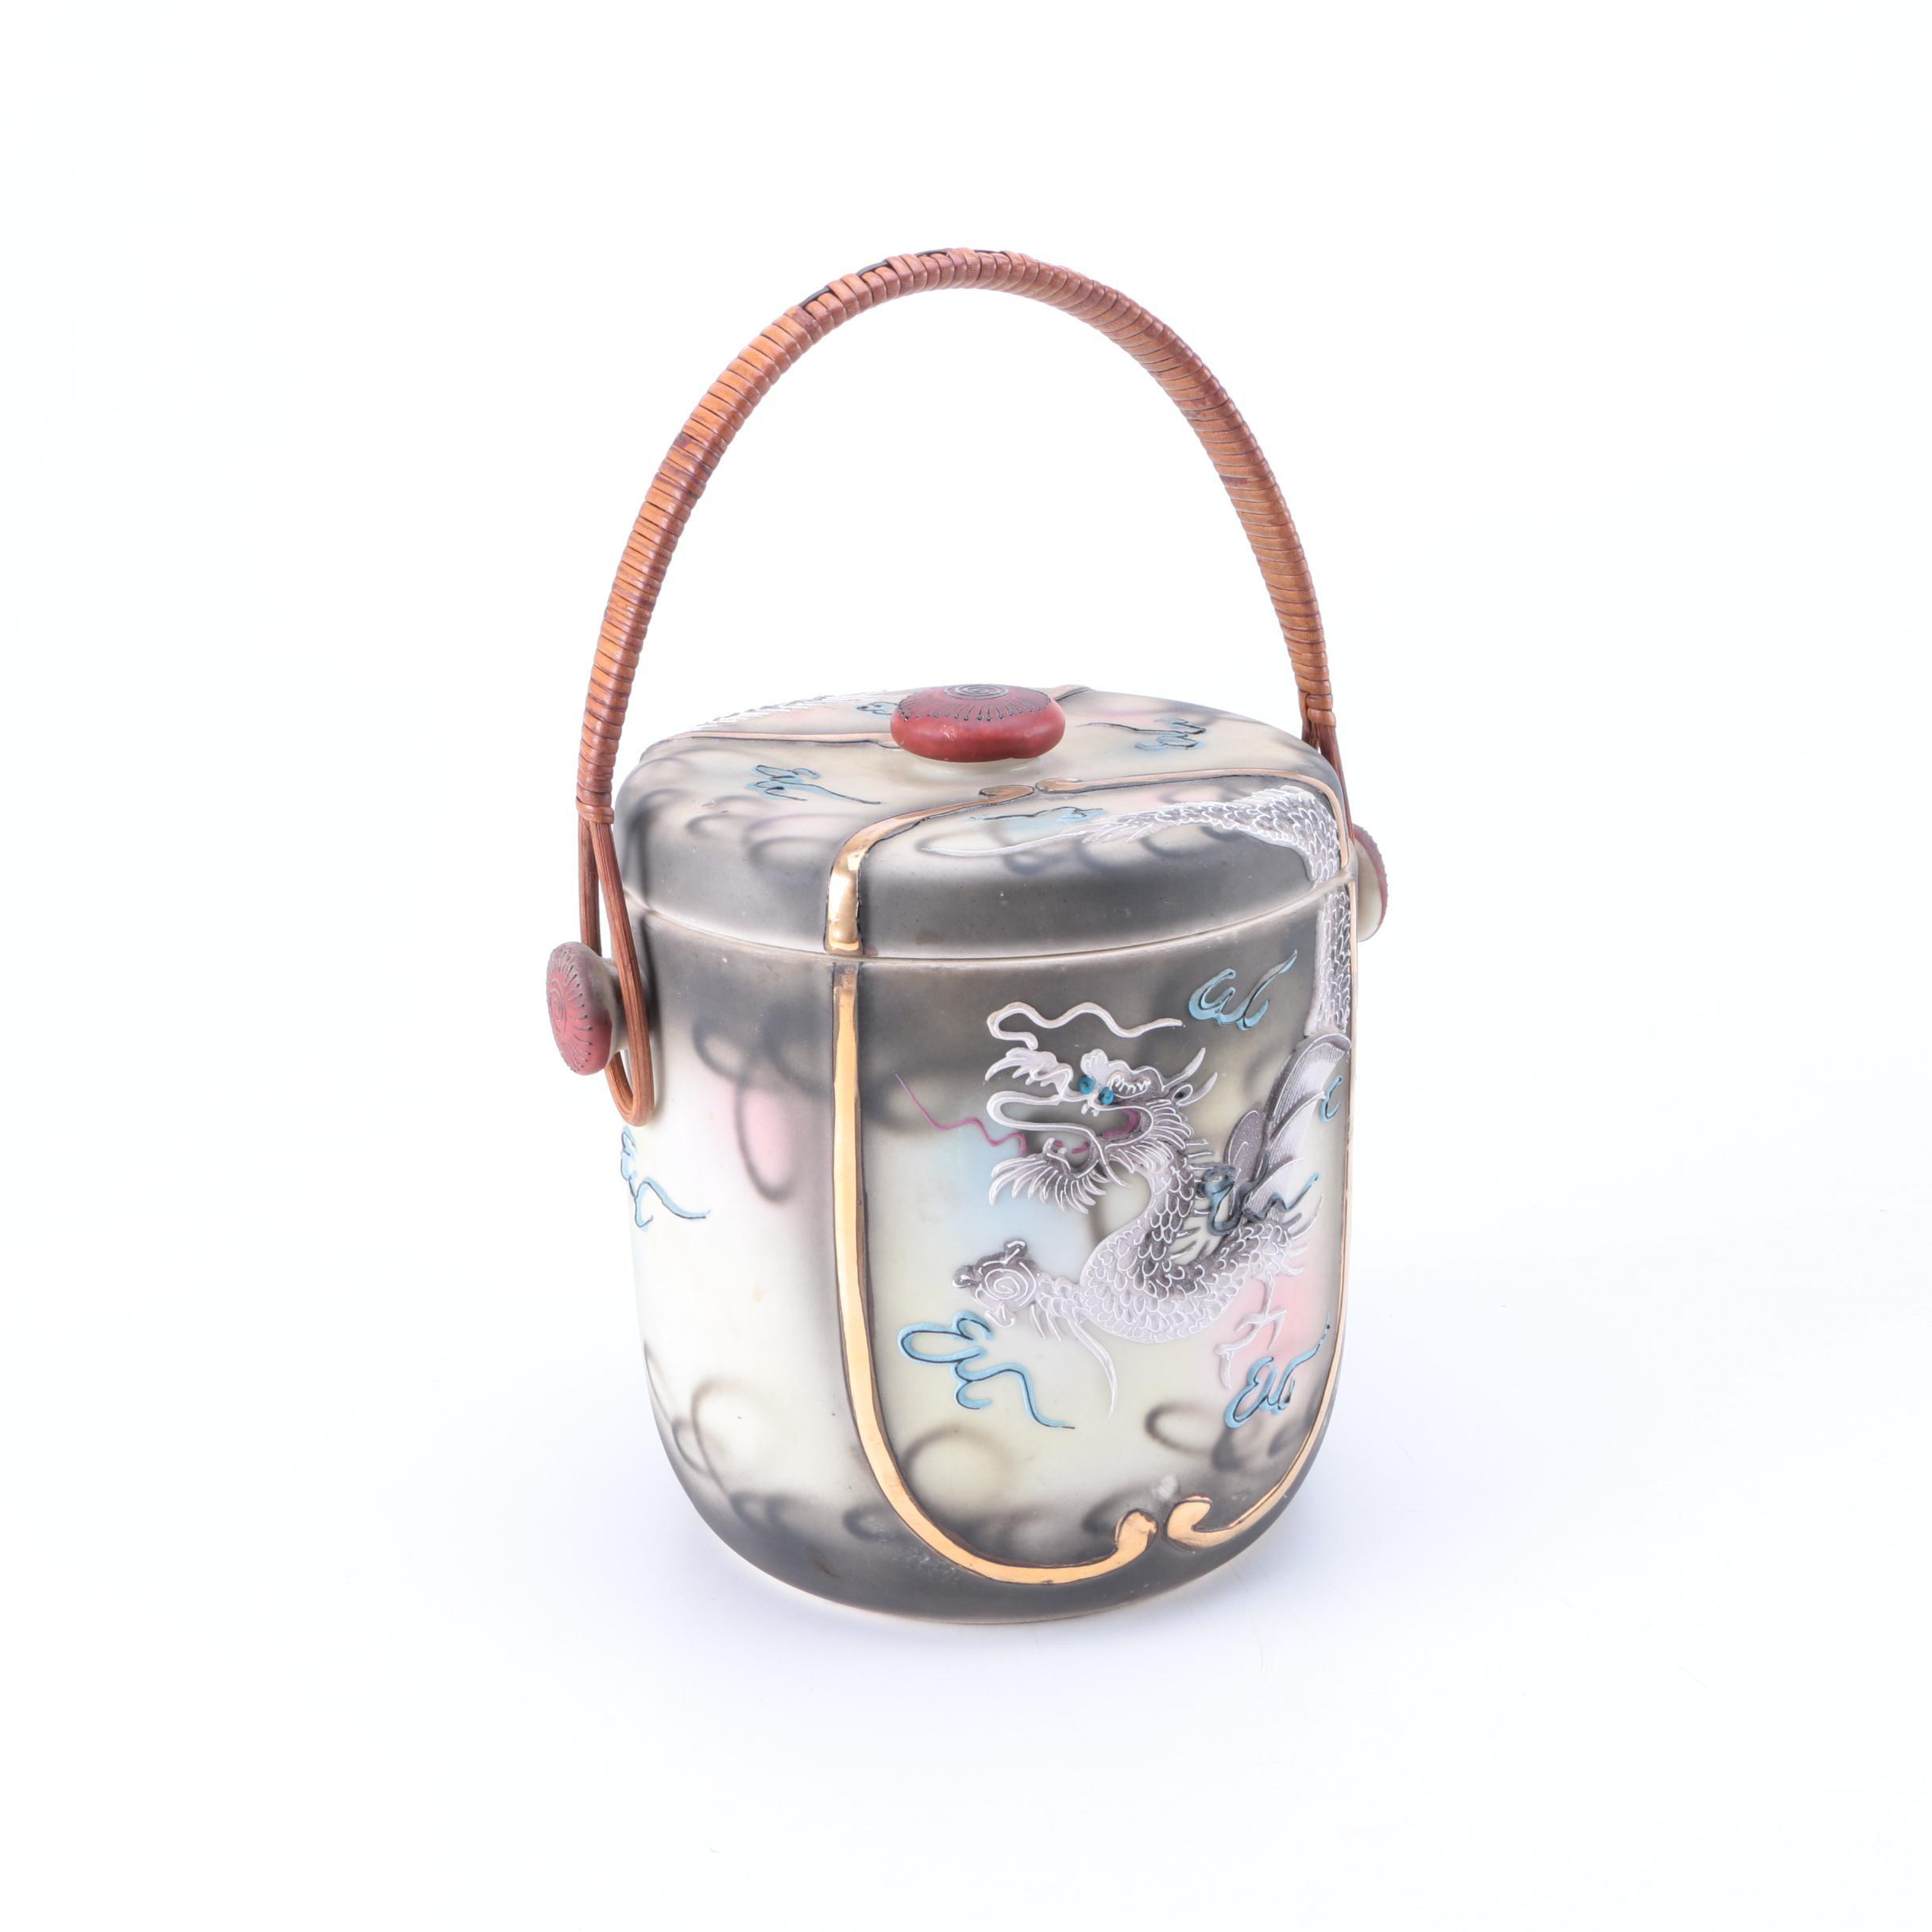 Japanese Hand-Painted Ceramic Ice Bucket